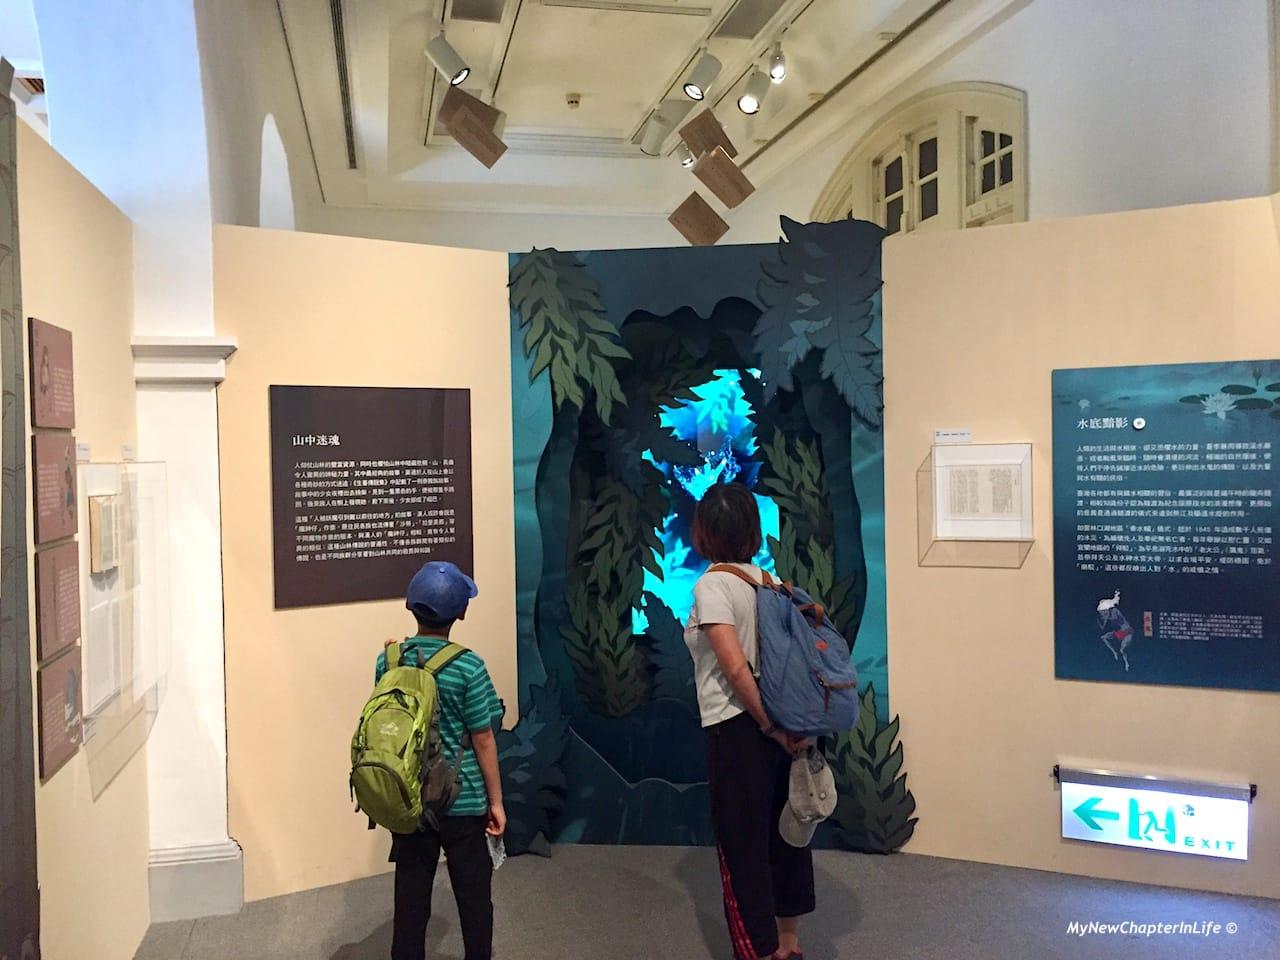 台灣鬼怪展覽 Taiwan Ghost Stories